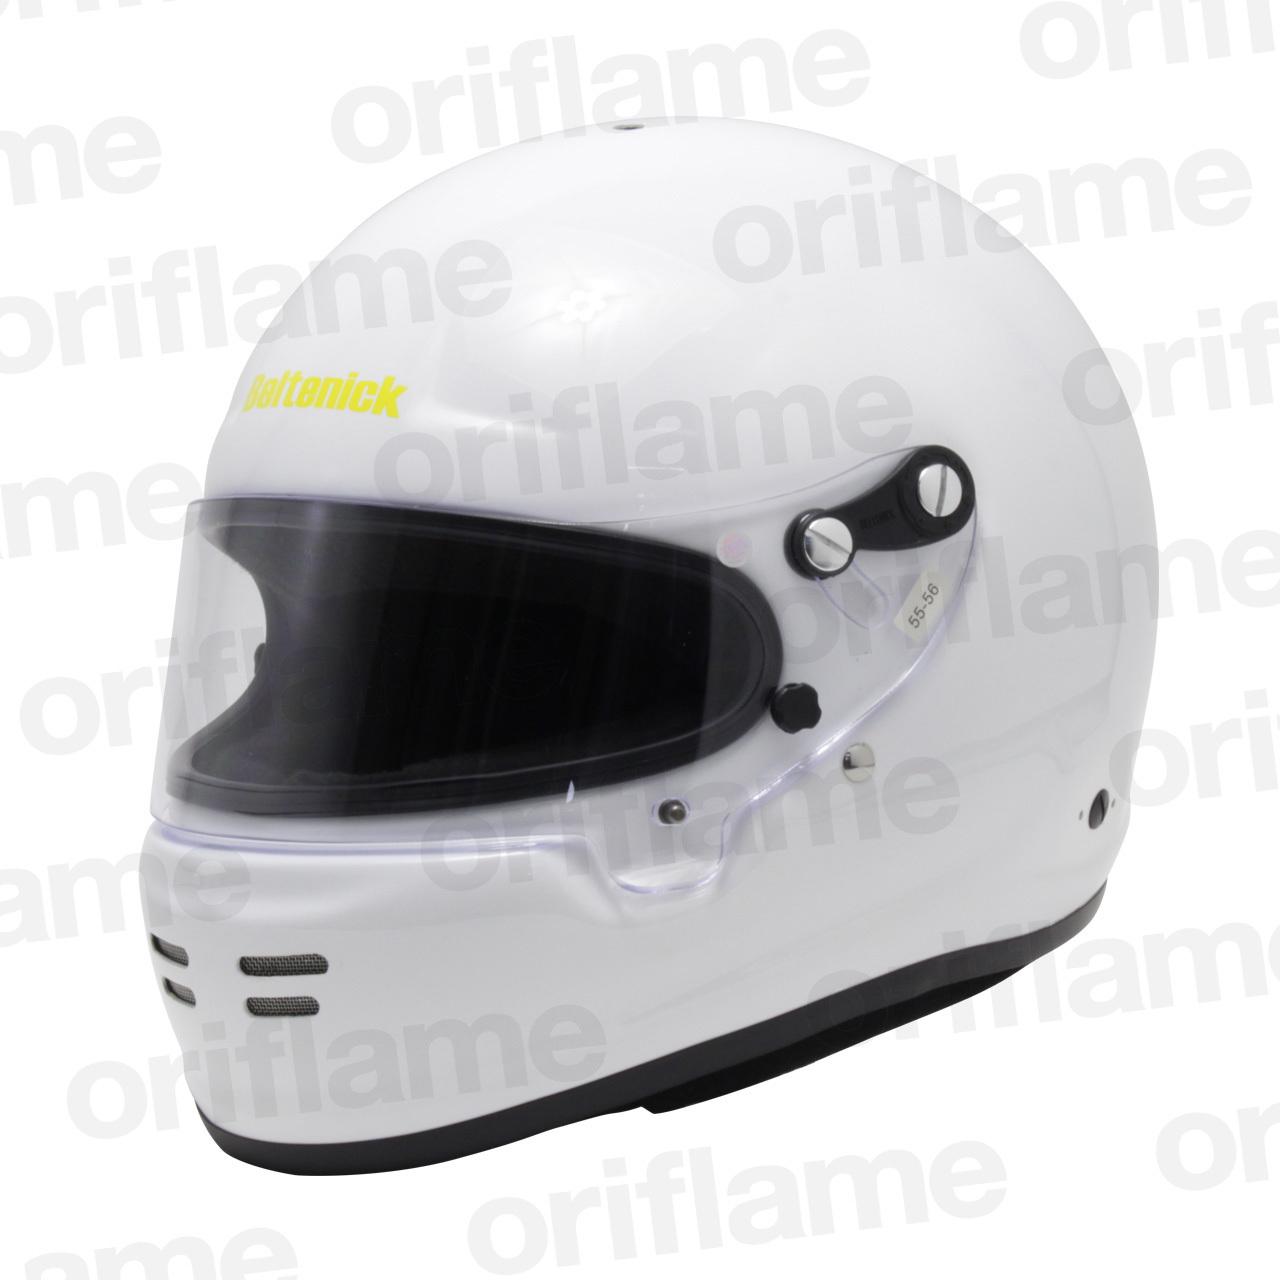 Beltenick・軽量レーシングヘルメット・四輪用